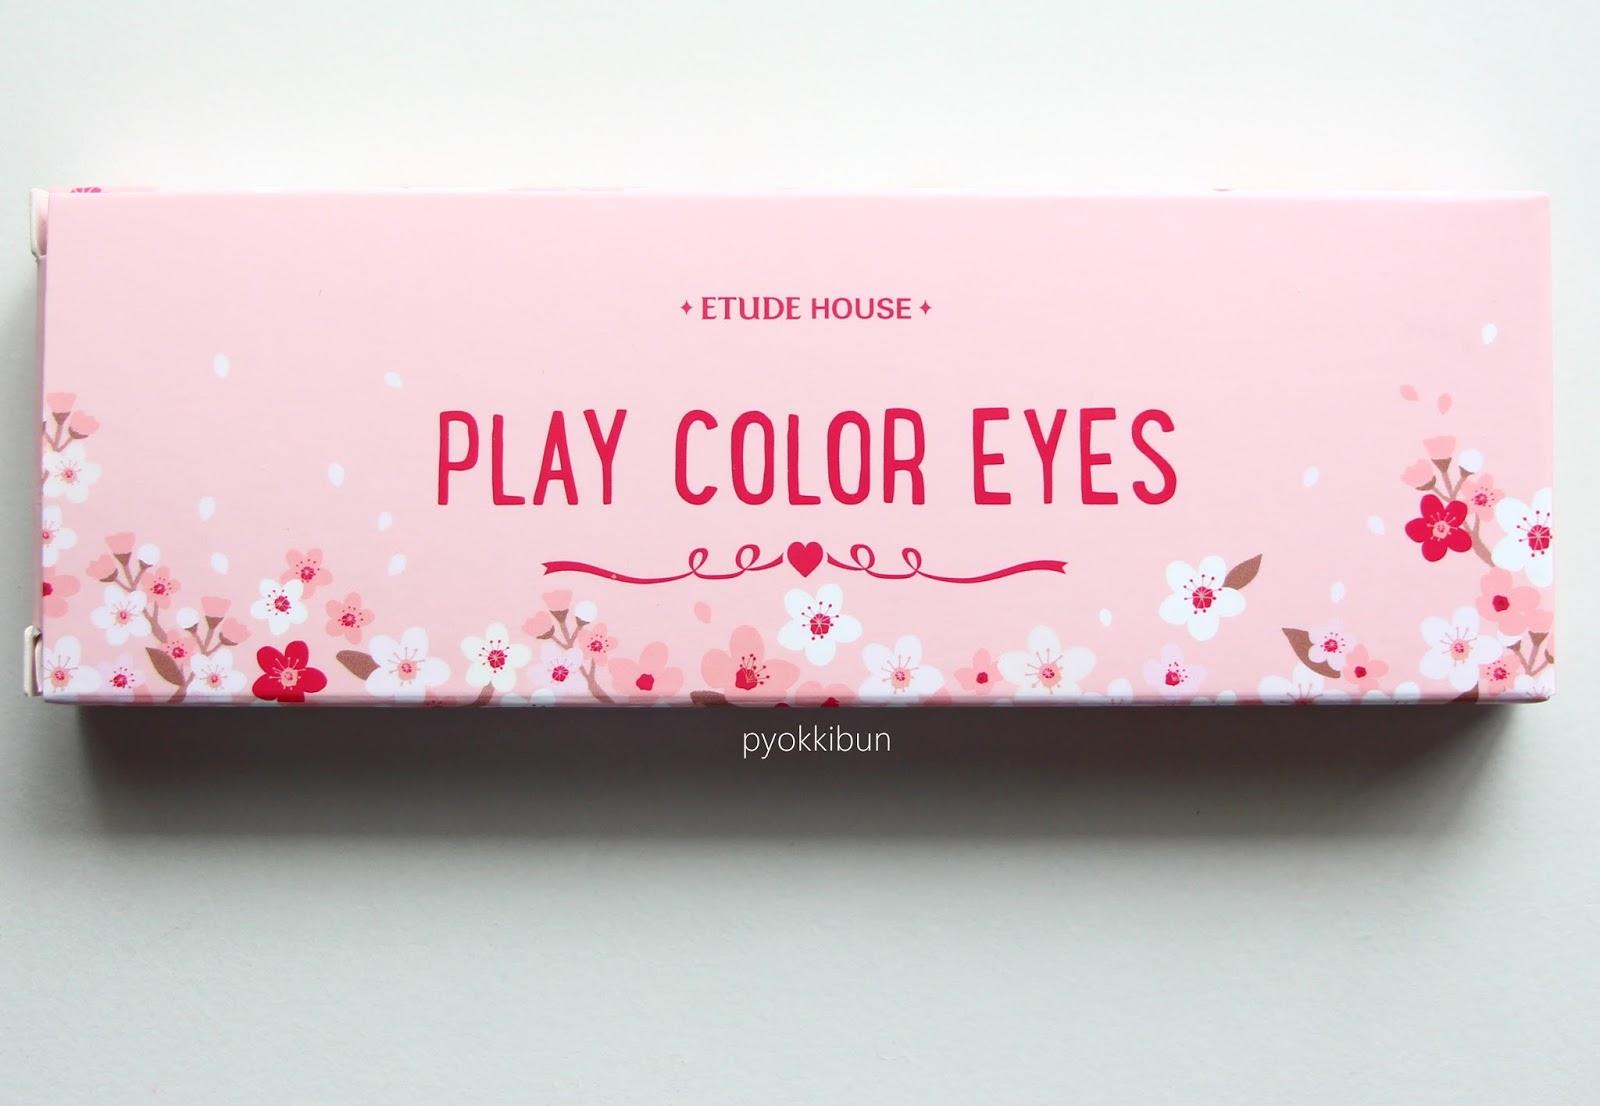 Etude House Play Colour Eyes in Cherry Blossom review - ♥ Pyokkibun ♥